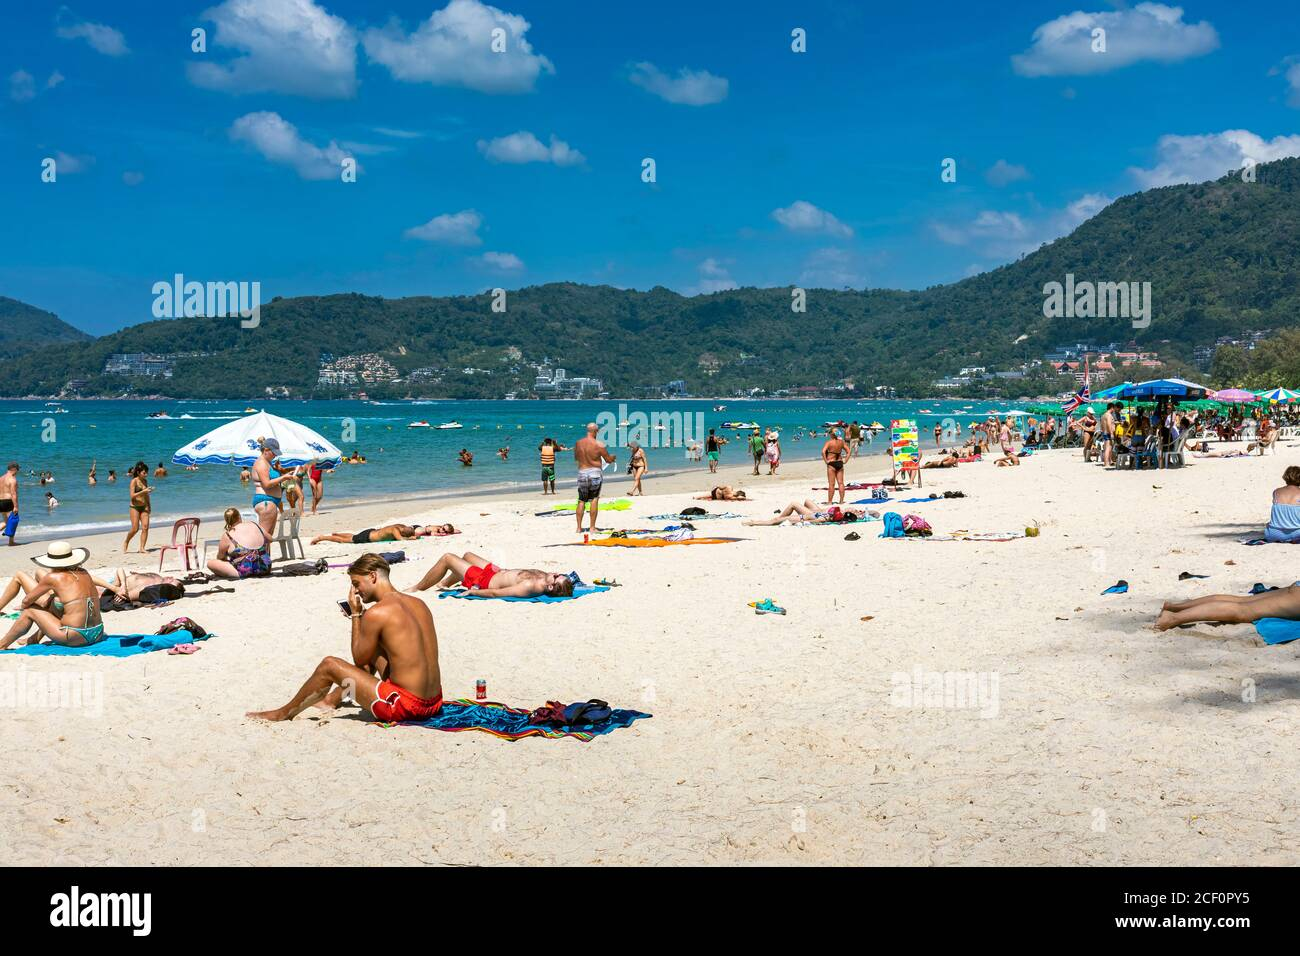 Tourists sunbathing on the beach, Patong, Phuket, Thailand Stock Photo